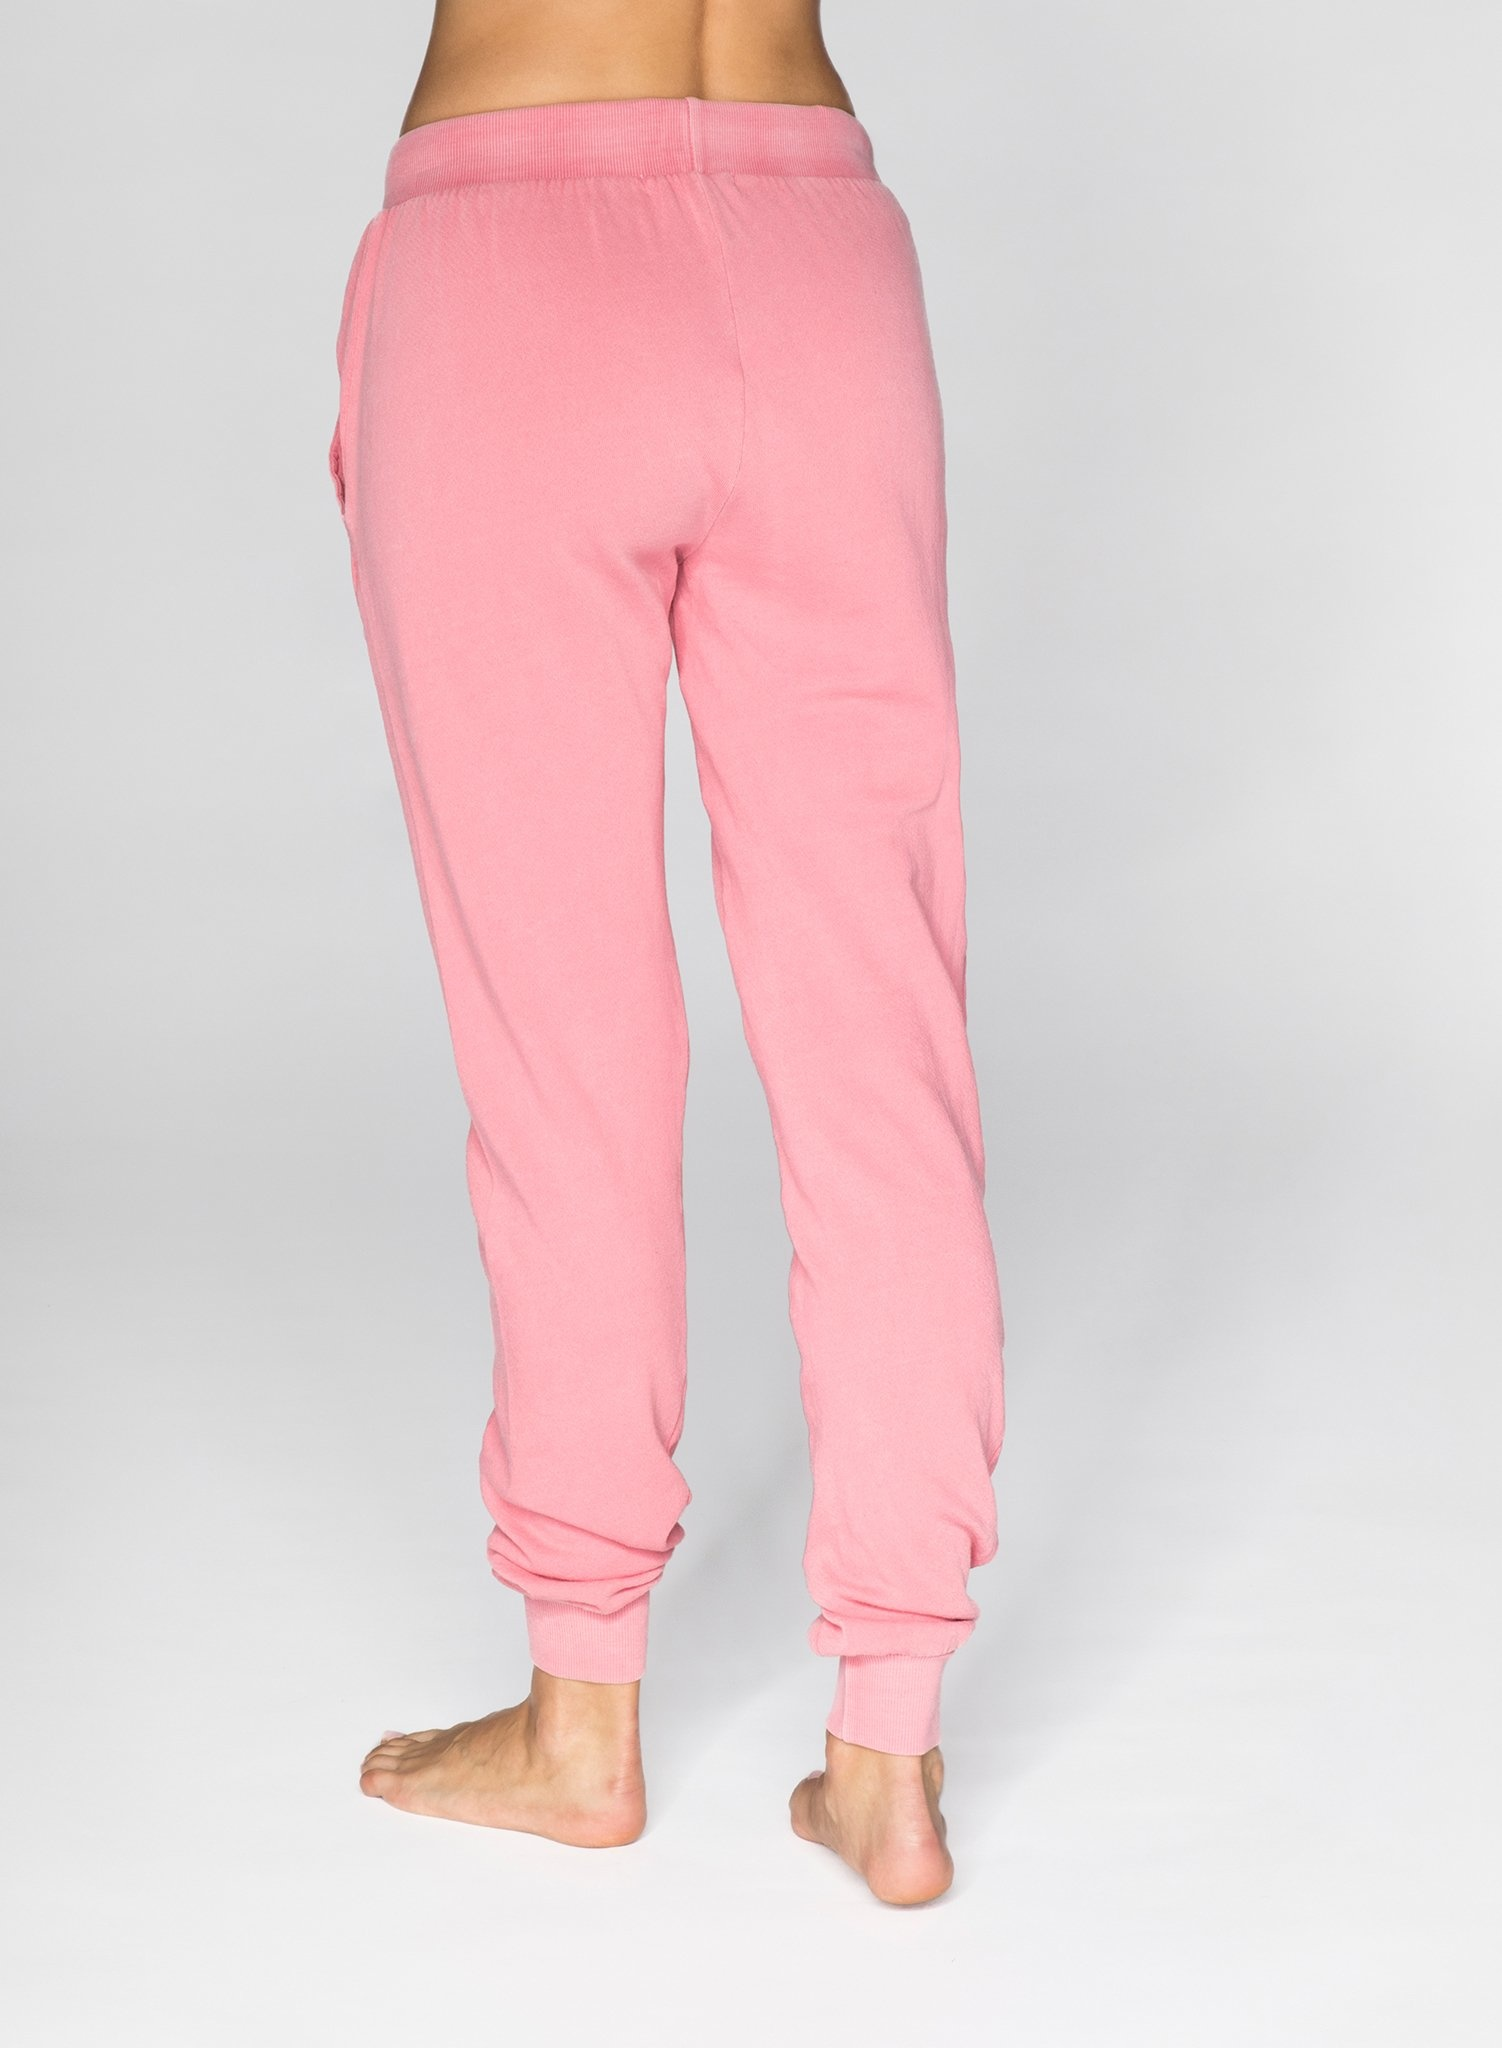 CHRLDR GLITTER LIPS - Flat Pocket Sweatpants